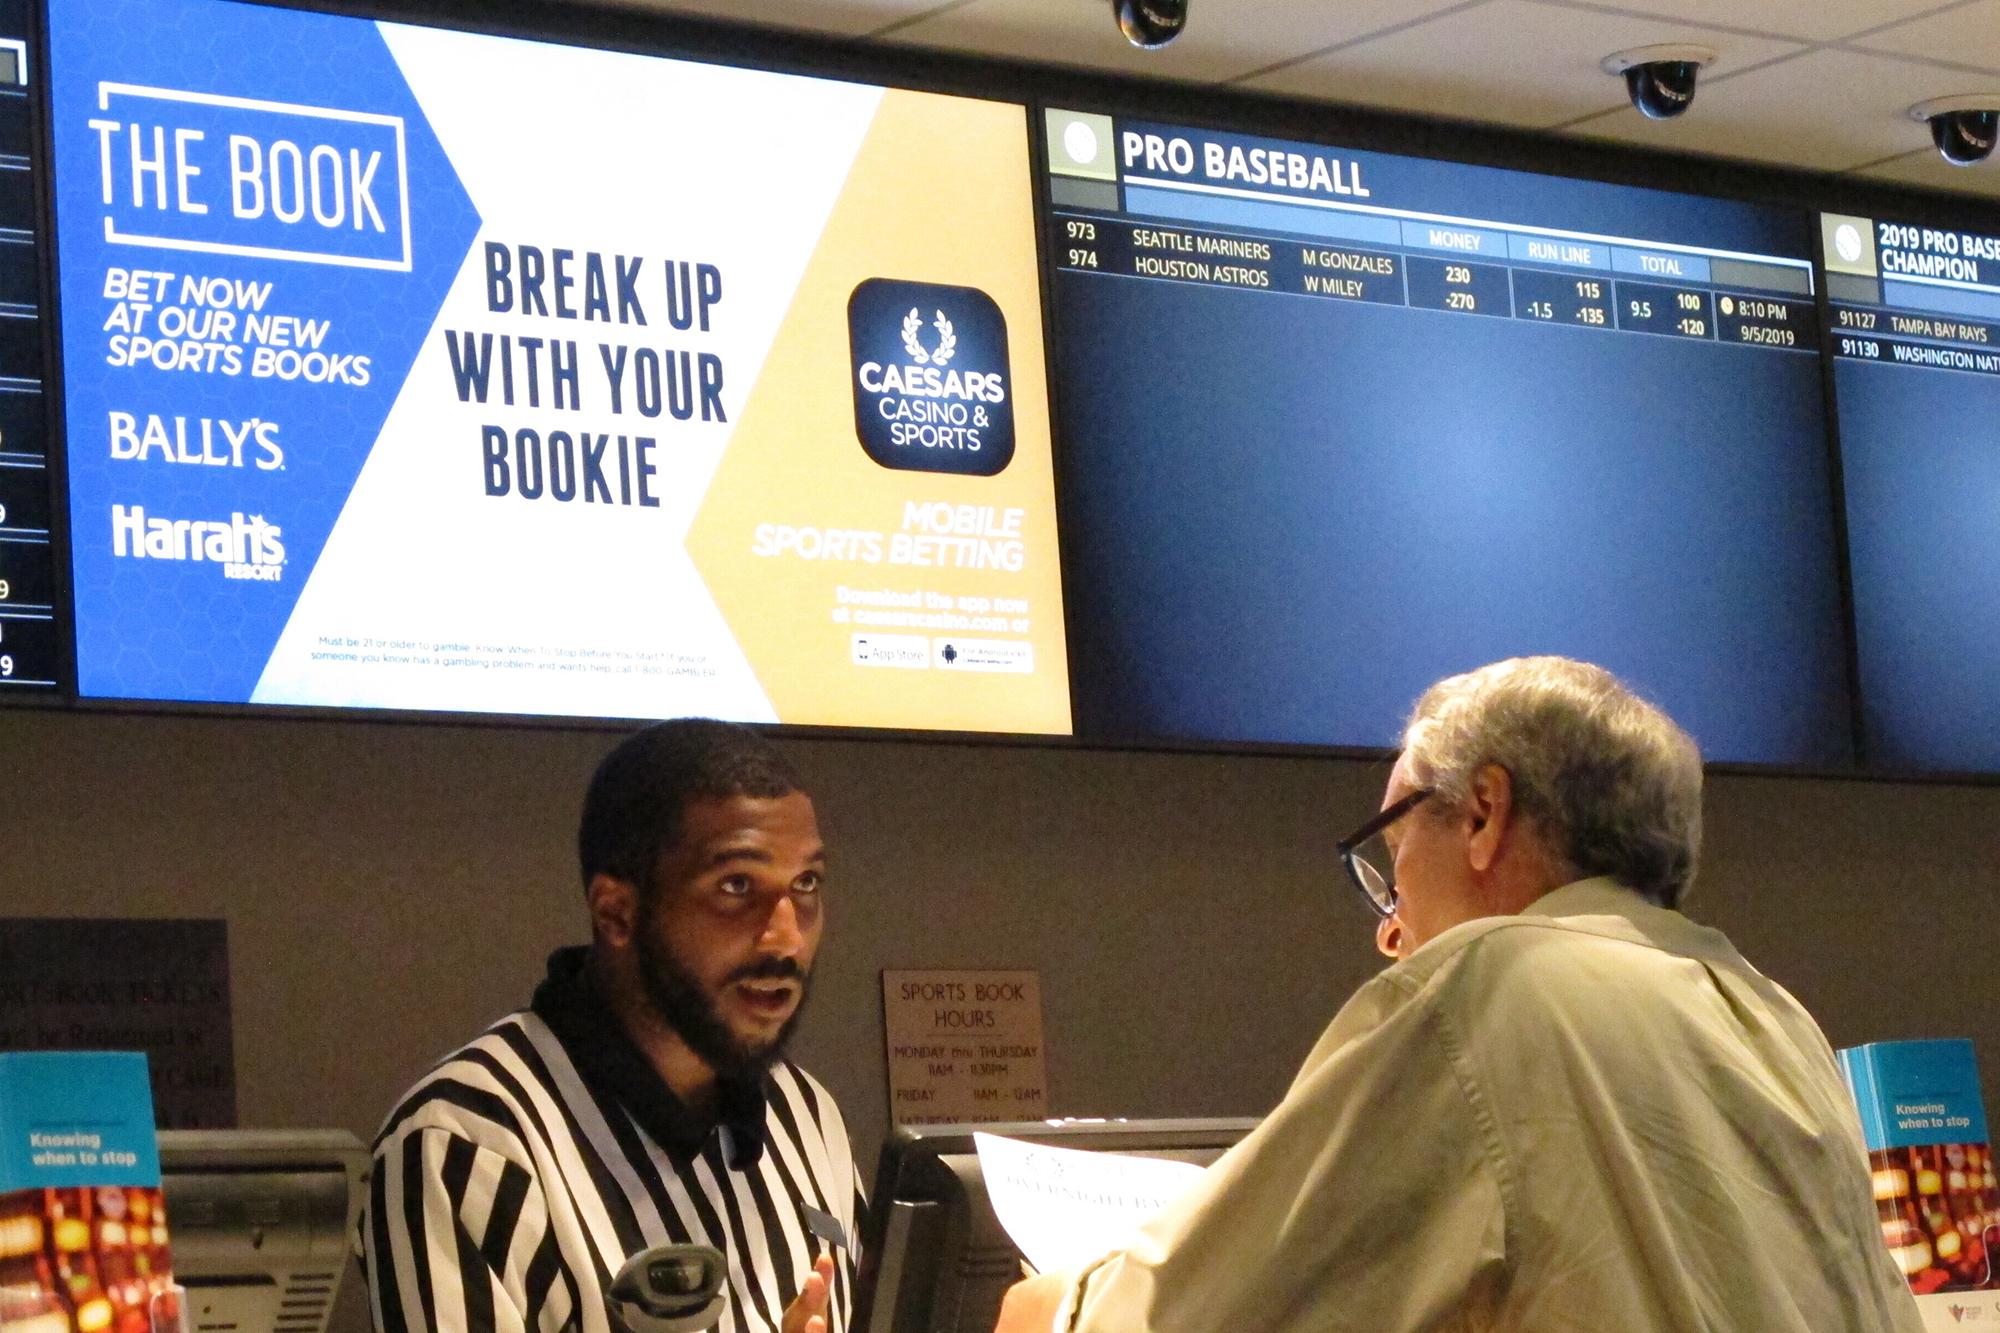 Nj sports betting updates for internet joelmir betting frase palmeirense